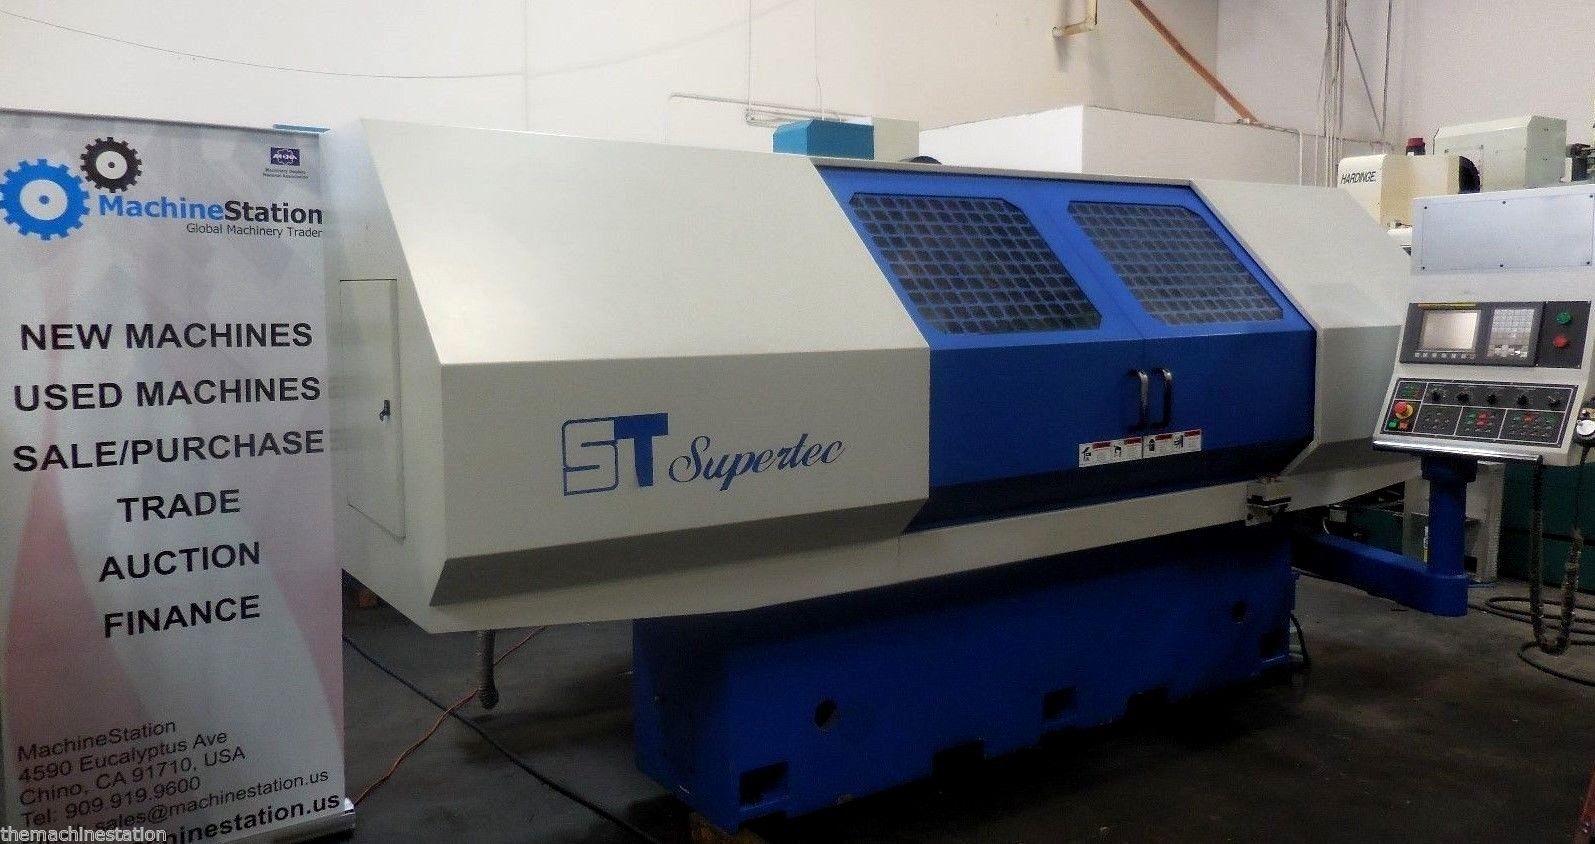 Supertec G32P-60 CNC Cylindrical Grinder USED